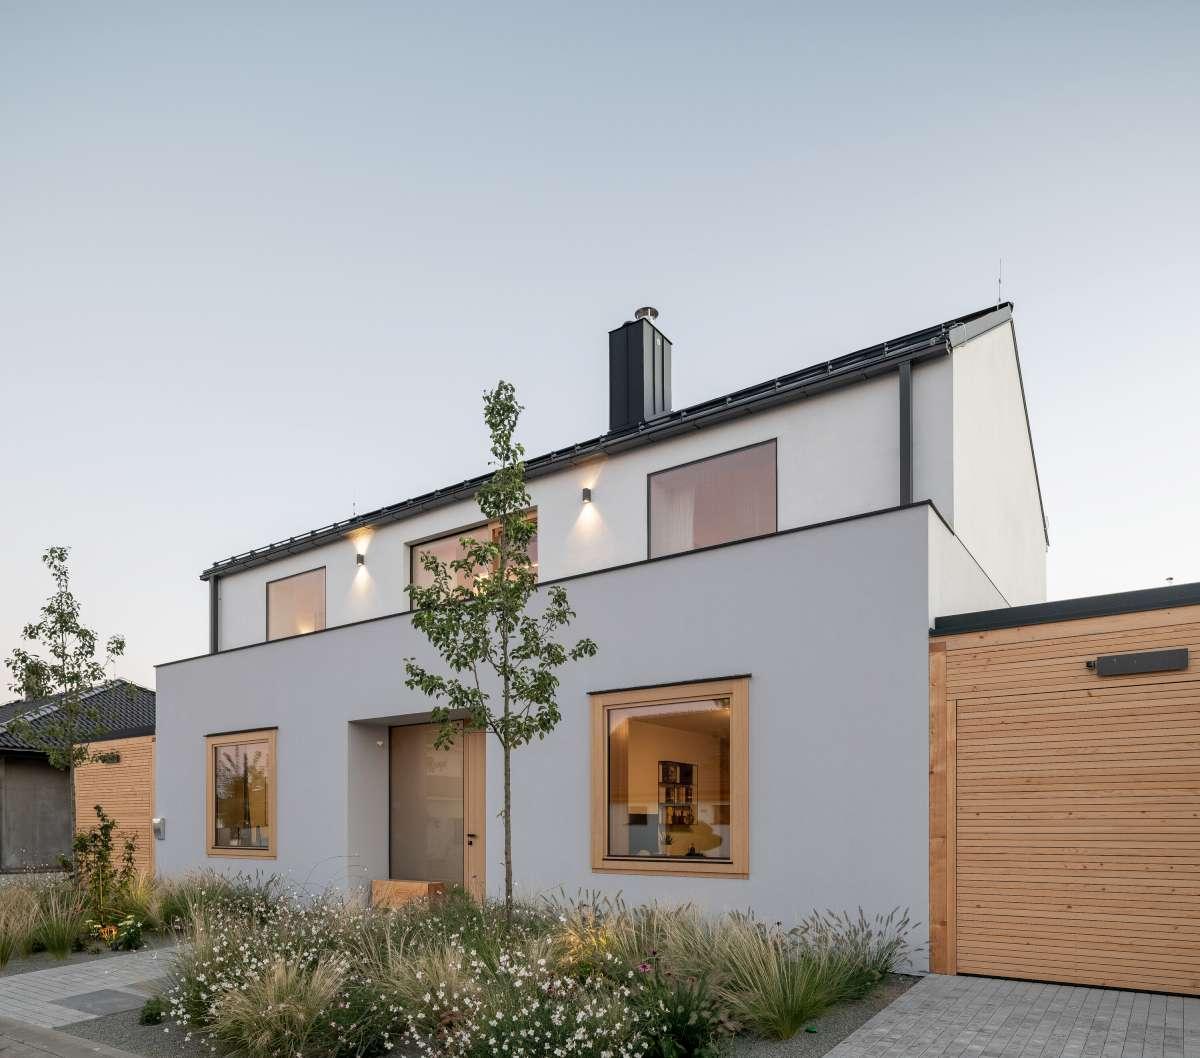 family house with atrium senaa alex shoots buildings 02 1200